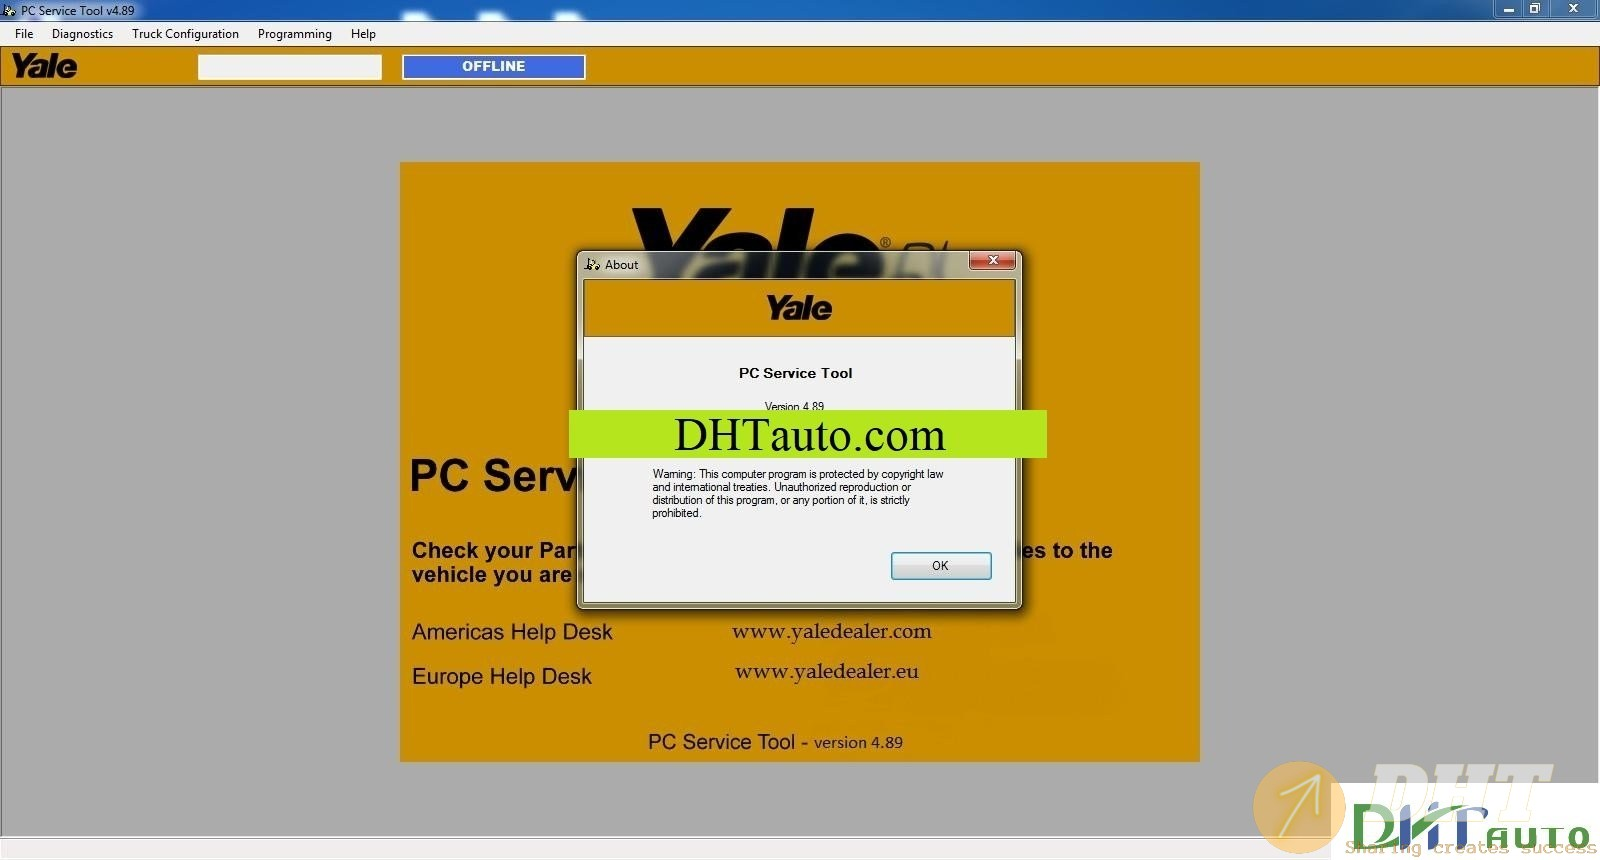 Yale-PC-Service-Tool-Version-4.89-2016-6.jpg